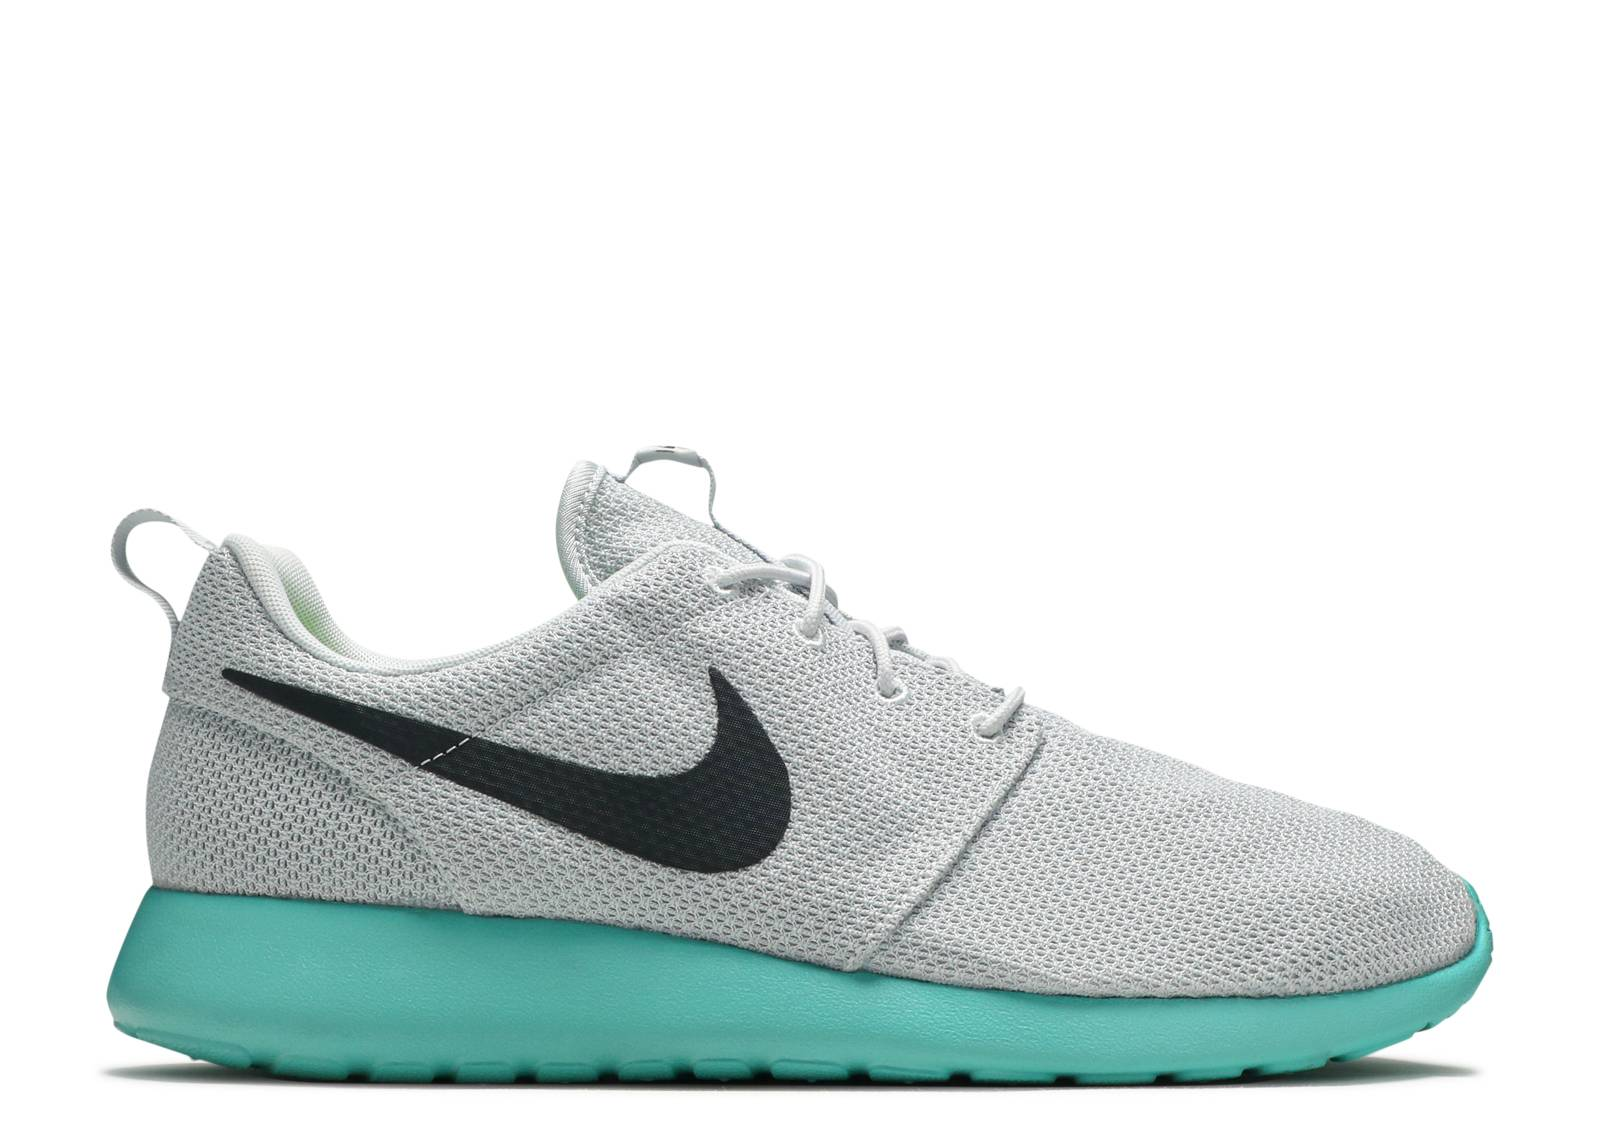 Nike Roshe Courir Calypso